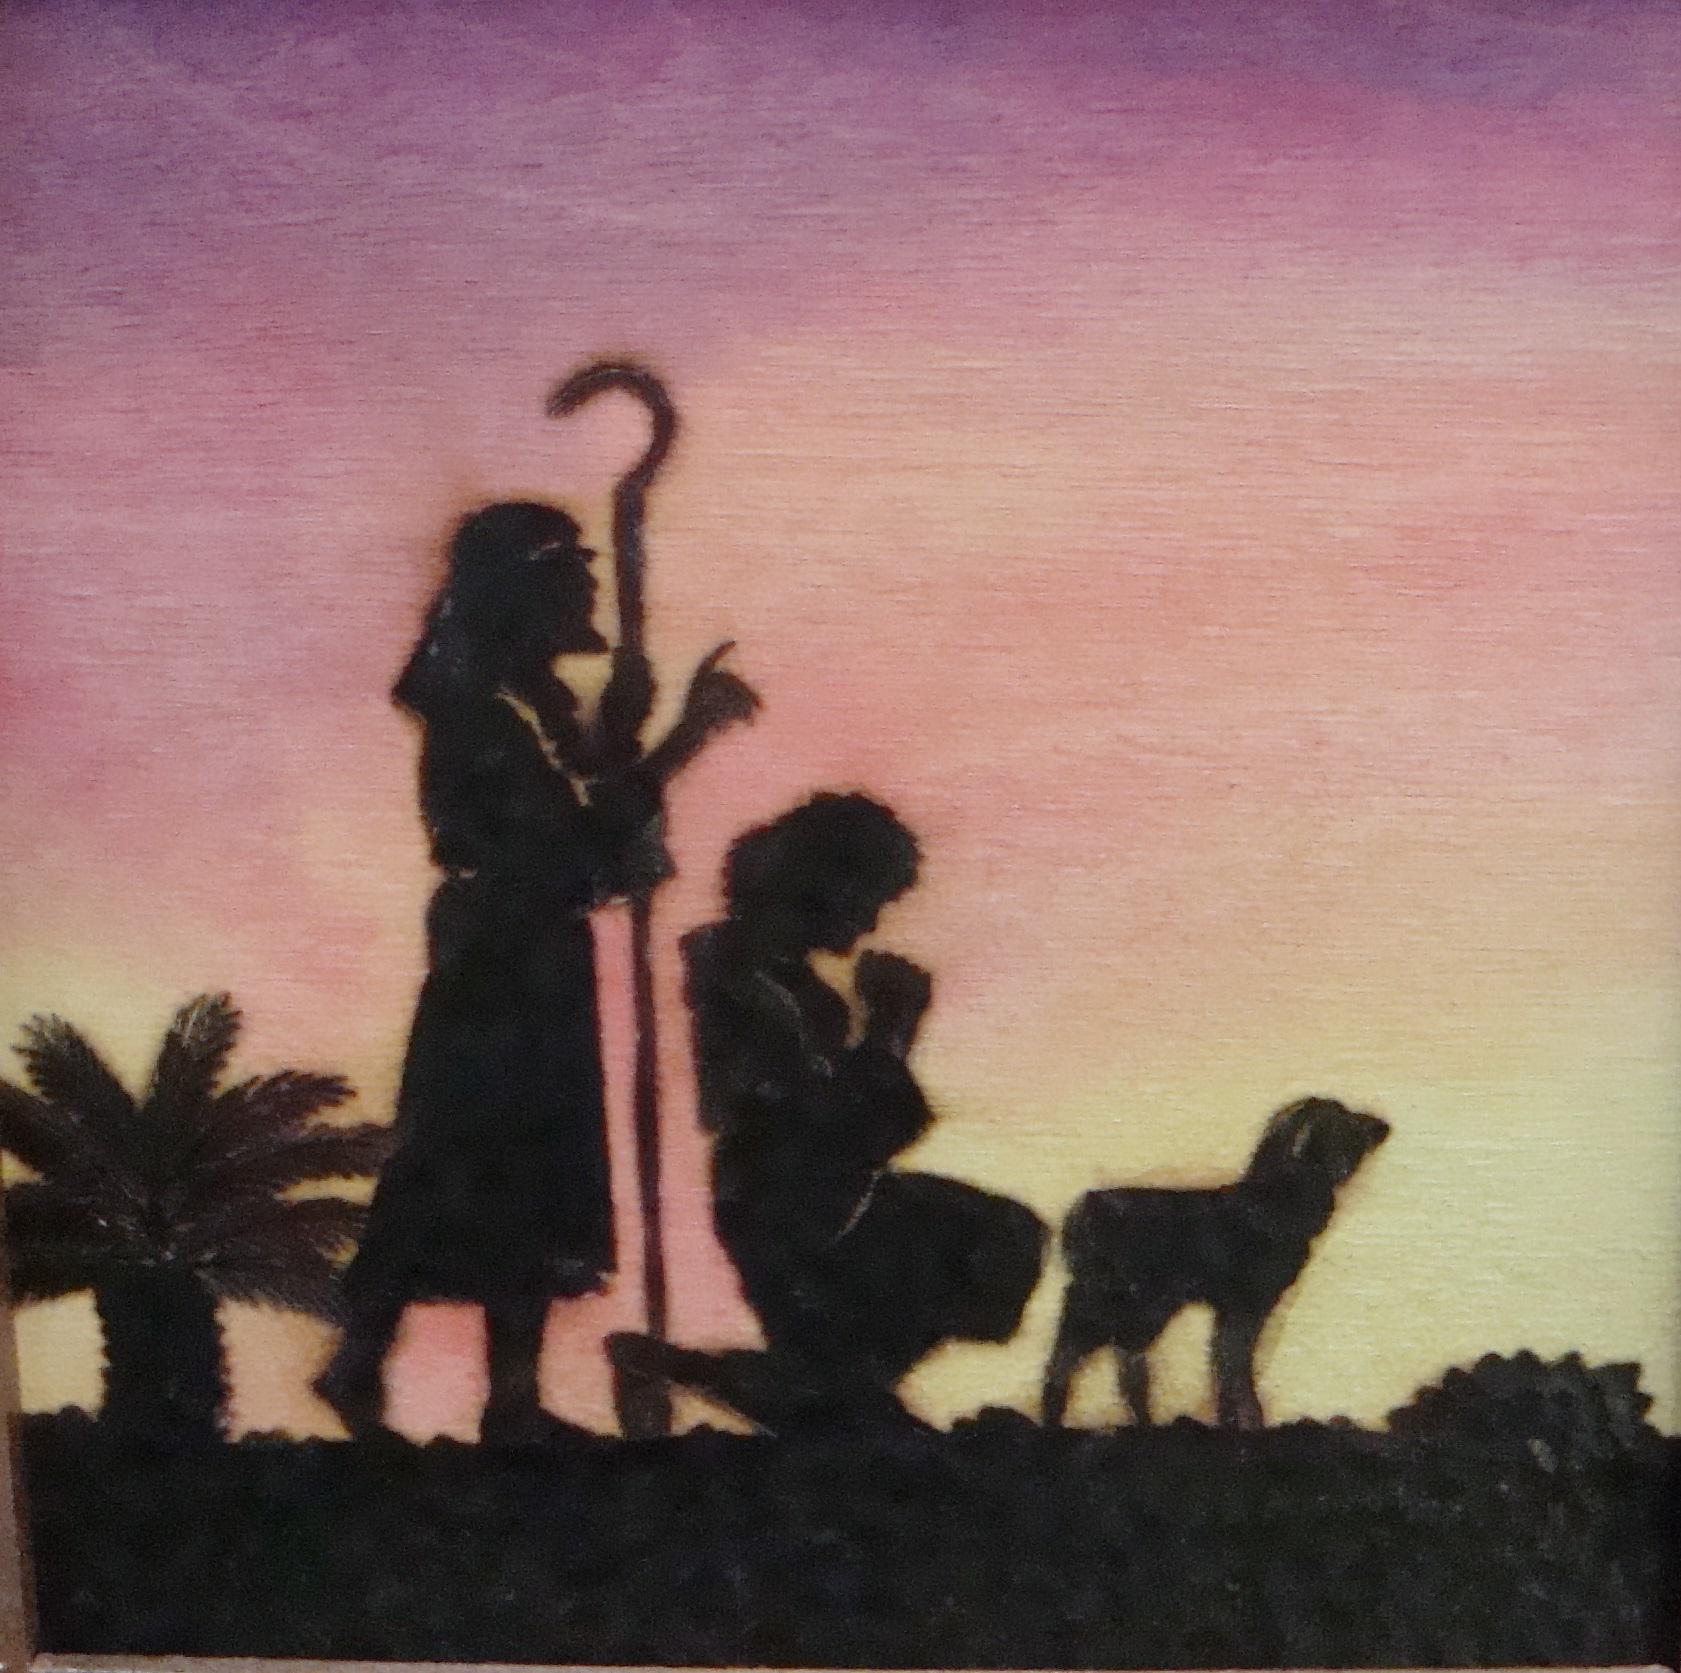 nativity silhouette shepherds offer thanks by dppratt on